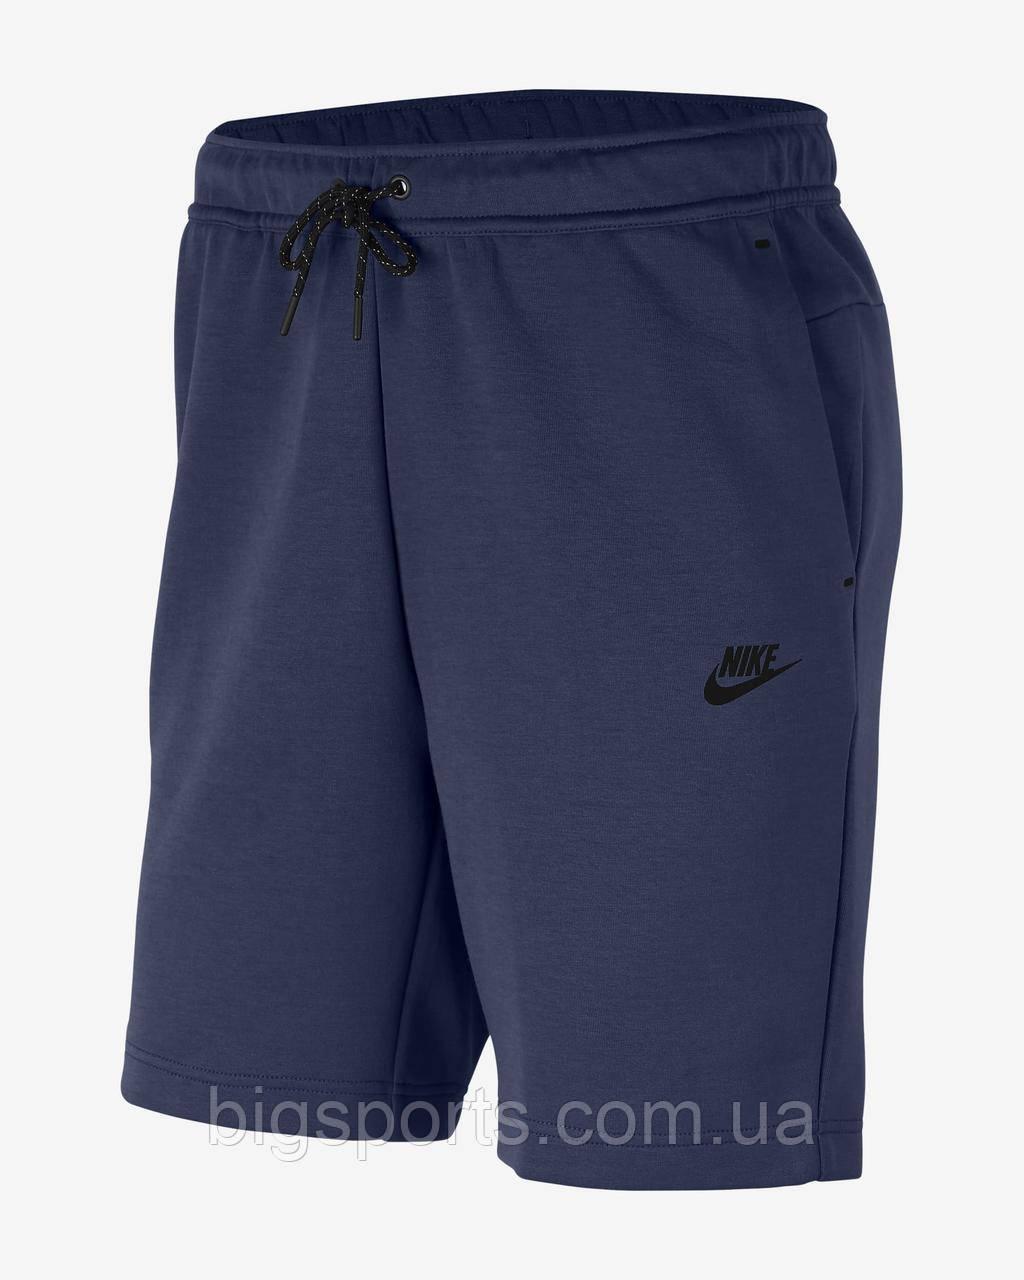 Шорты муж. Nike M Nsw Tch Flc Short (арт. CU4503-410)